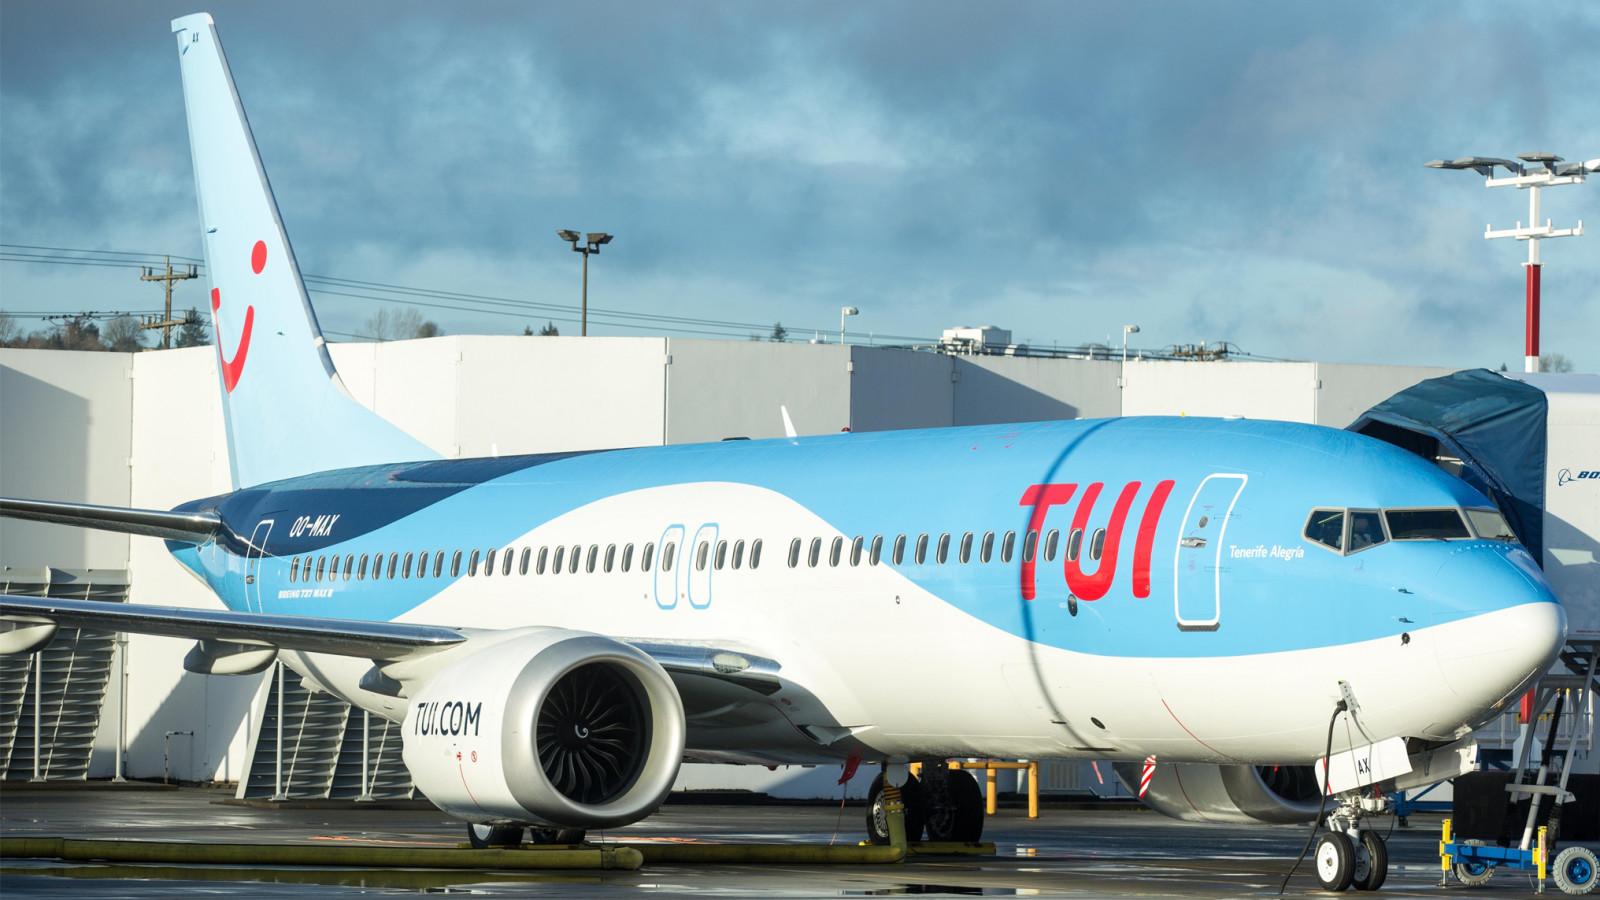 De eerste Boeing 737 MAX van TUI Belgium - foto: TUI Group